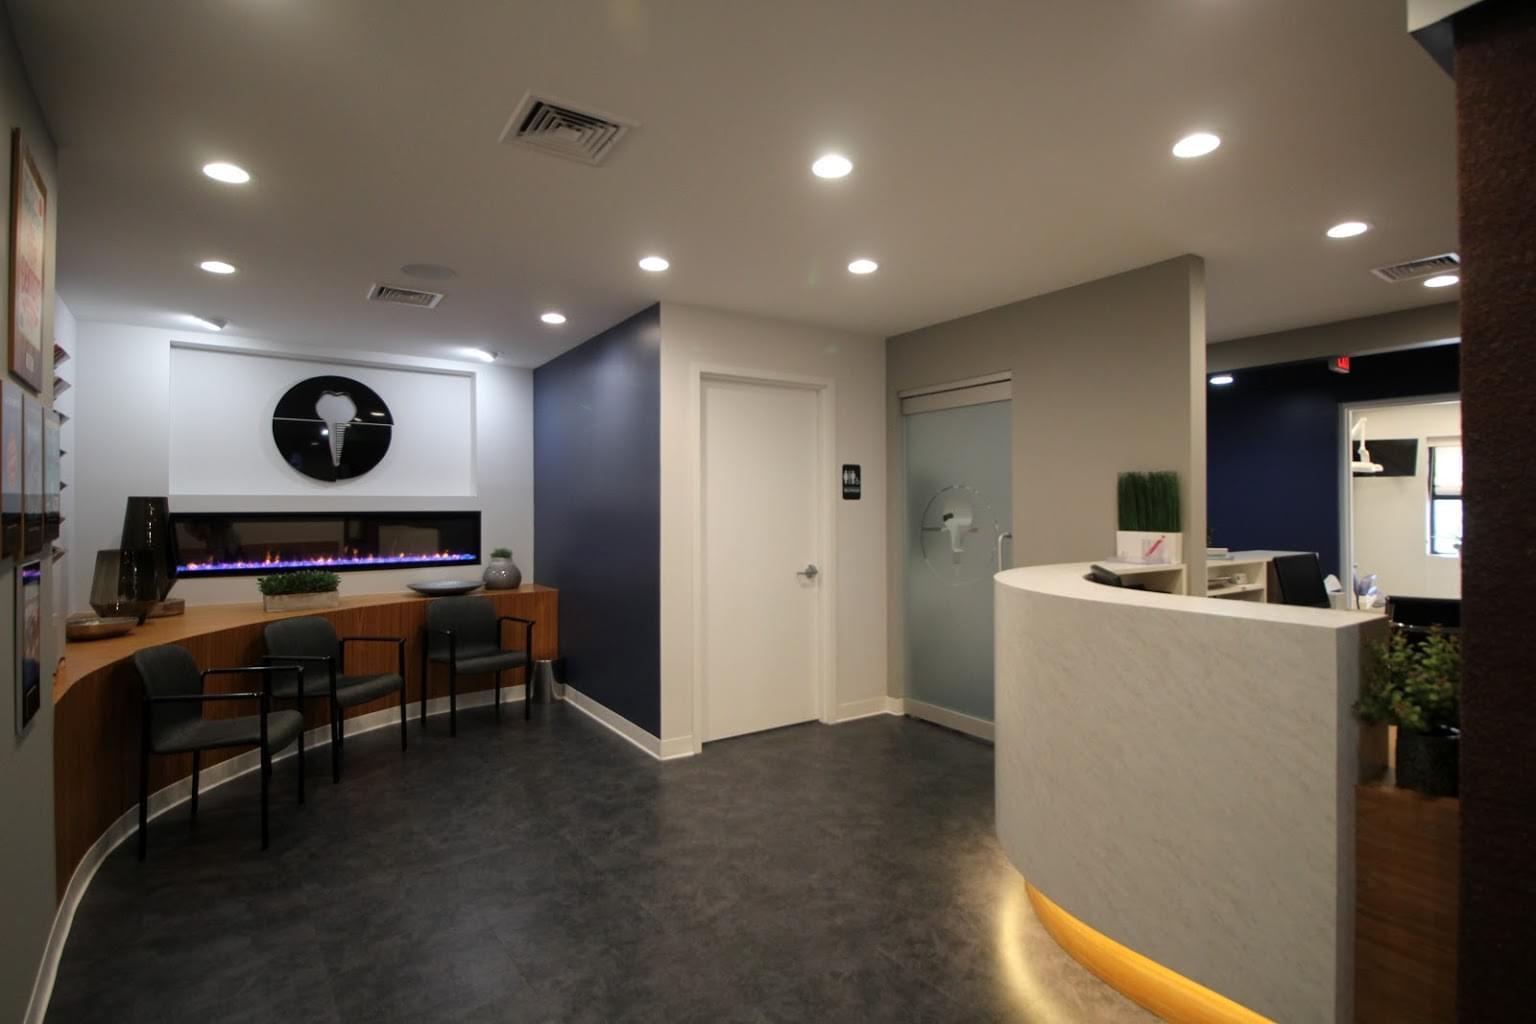 Edison Periodontics and Implantology Dental Office in Edison, NJ waiting room